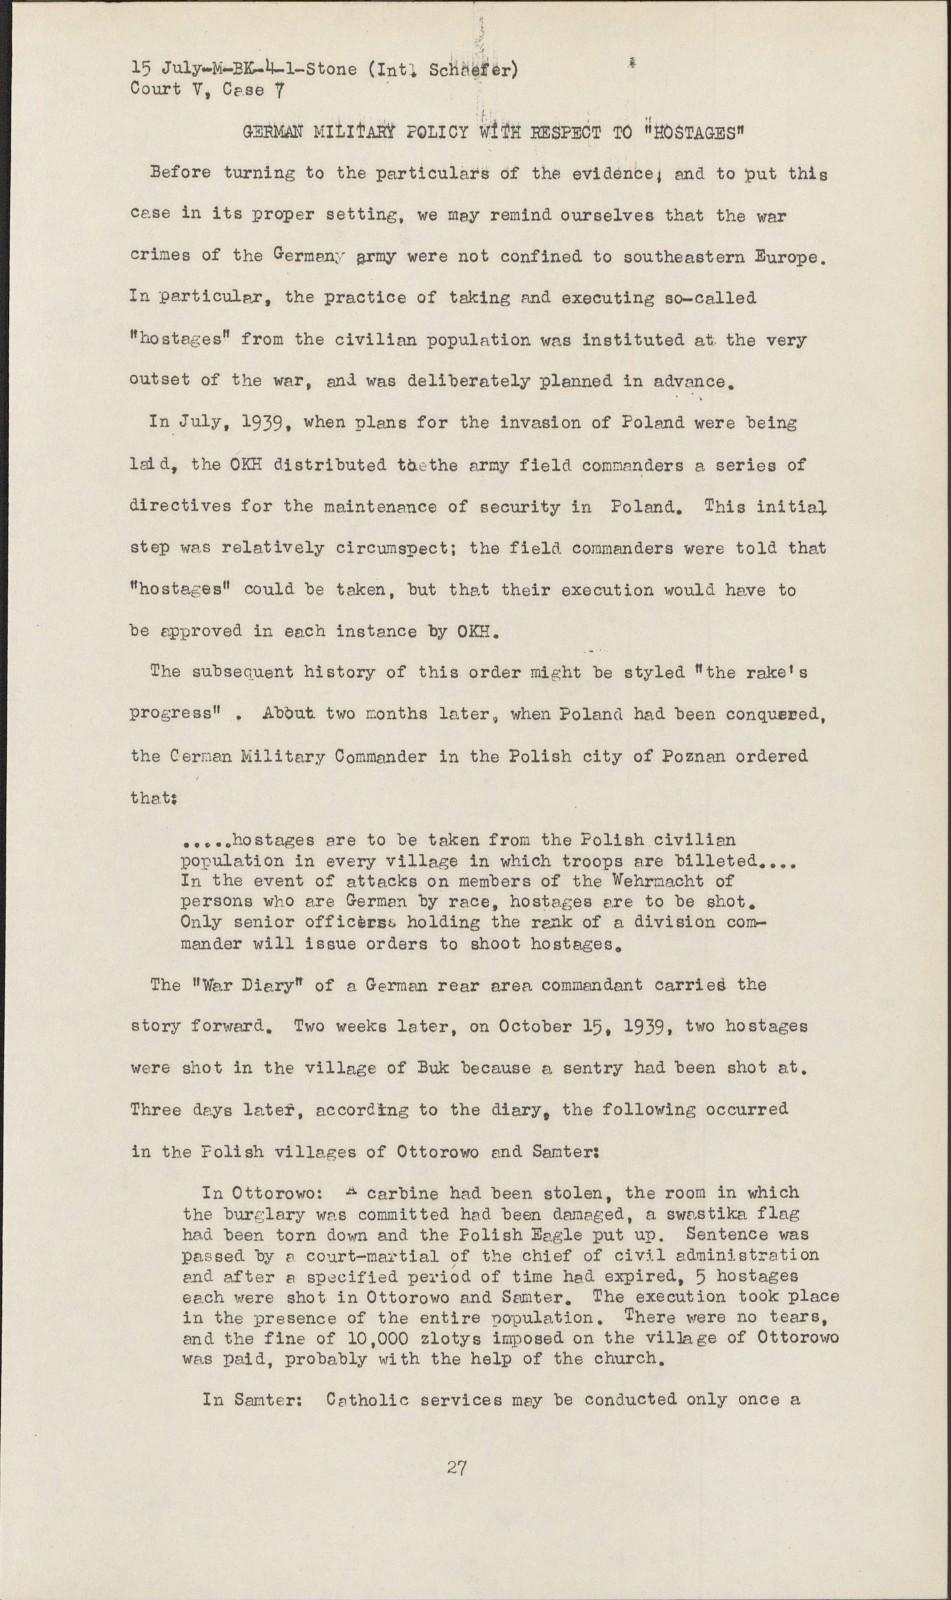 Nuremberg - Transcript Viewer - Transcript for NMT 7